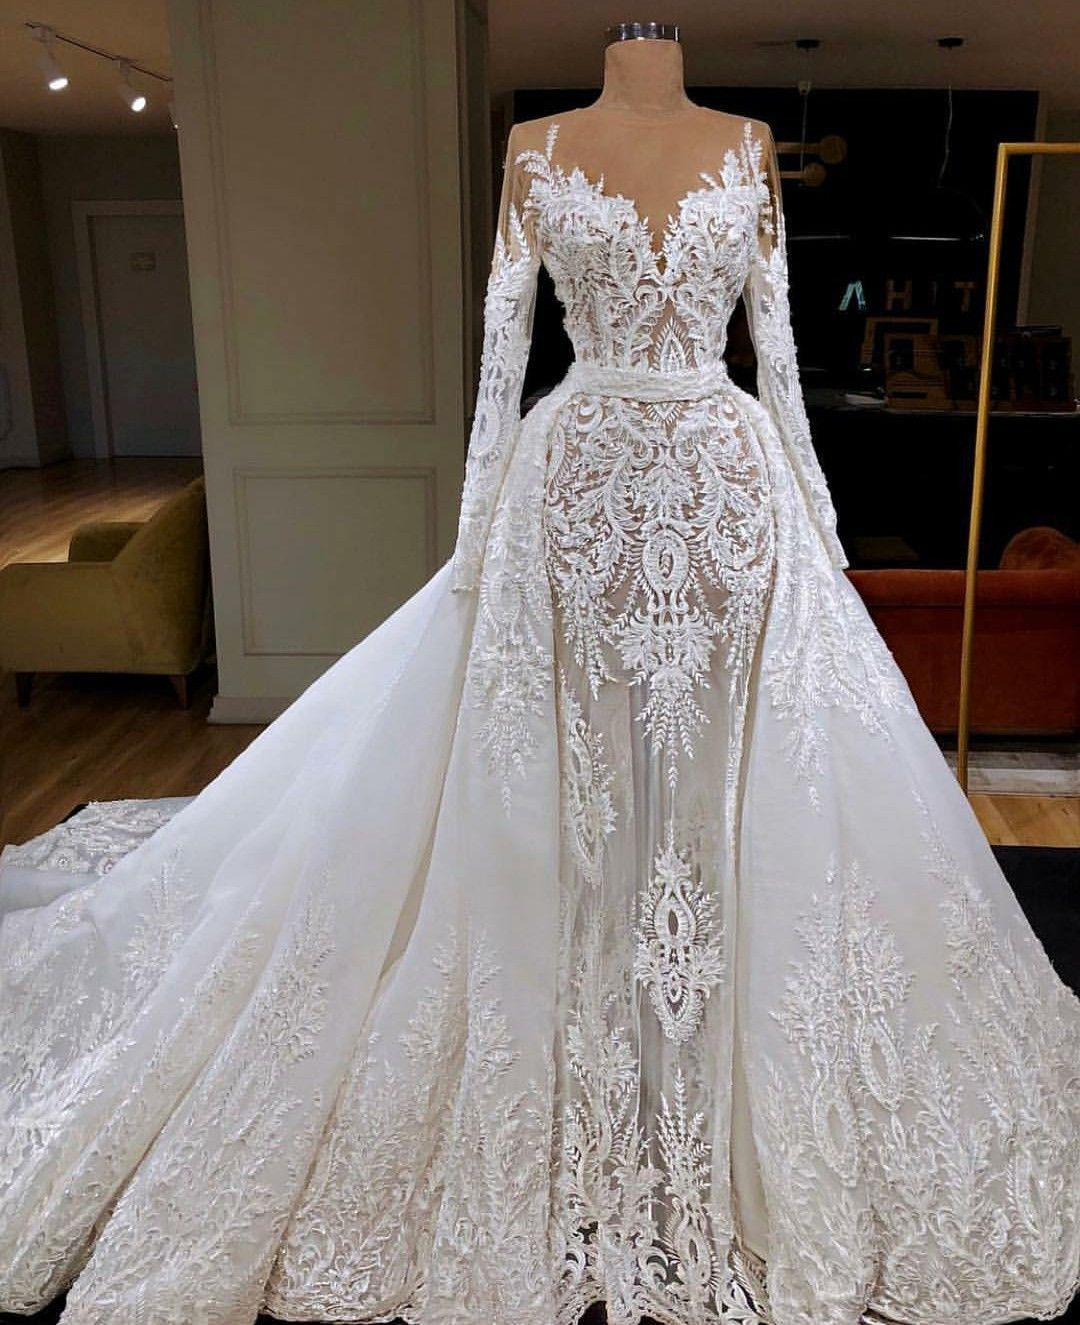 Valdrin Sahiti Wedding dresses lace, Lace weddings